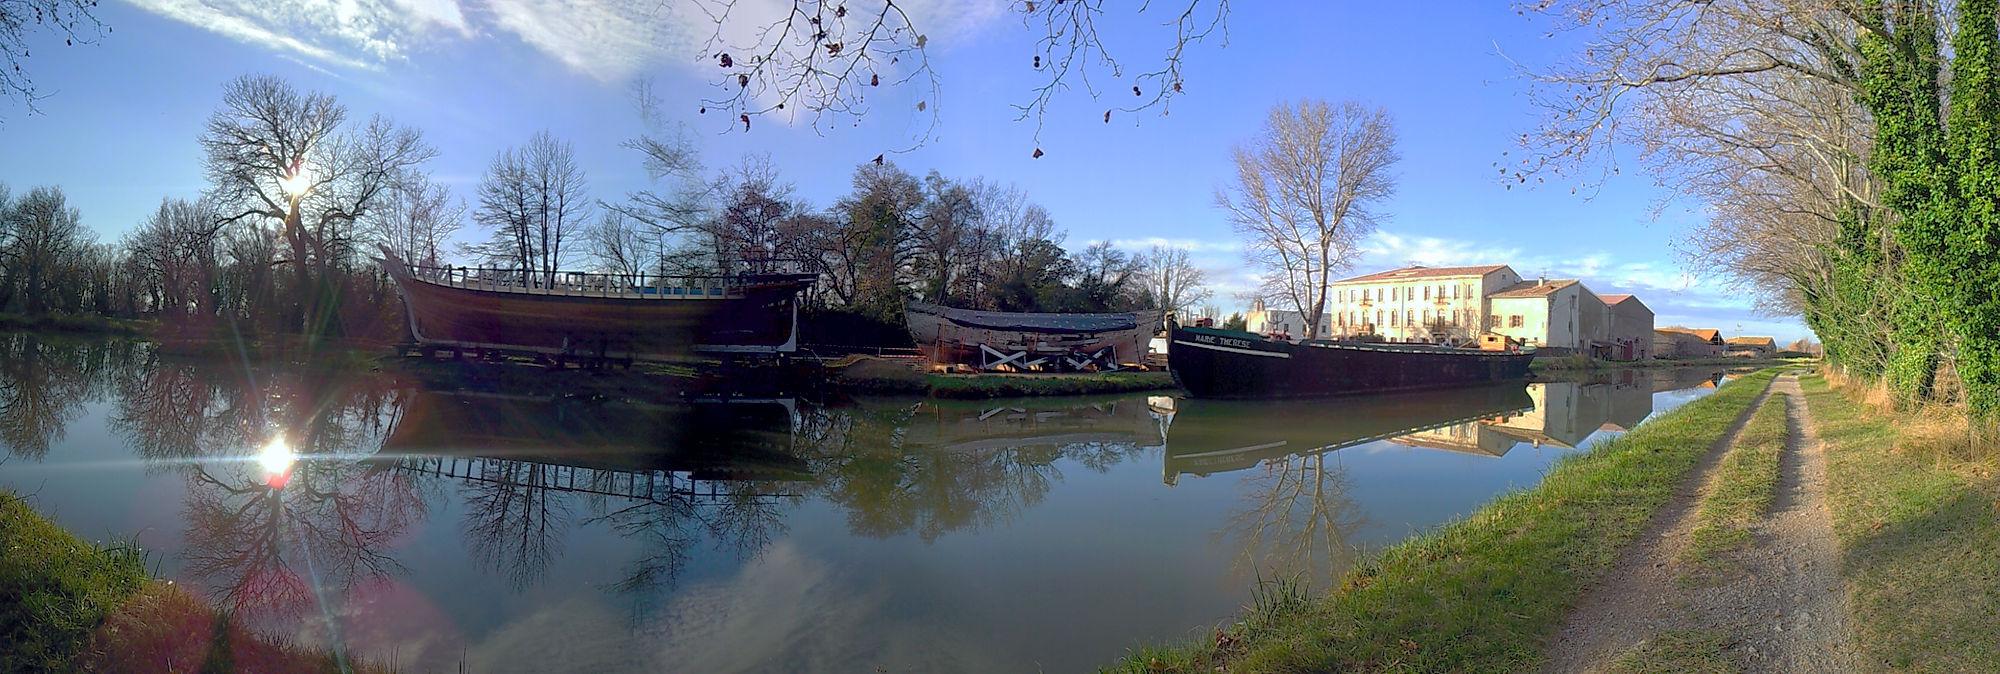 Werft am Canal de la Robine ~ Handypanorama